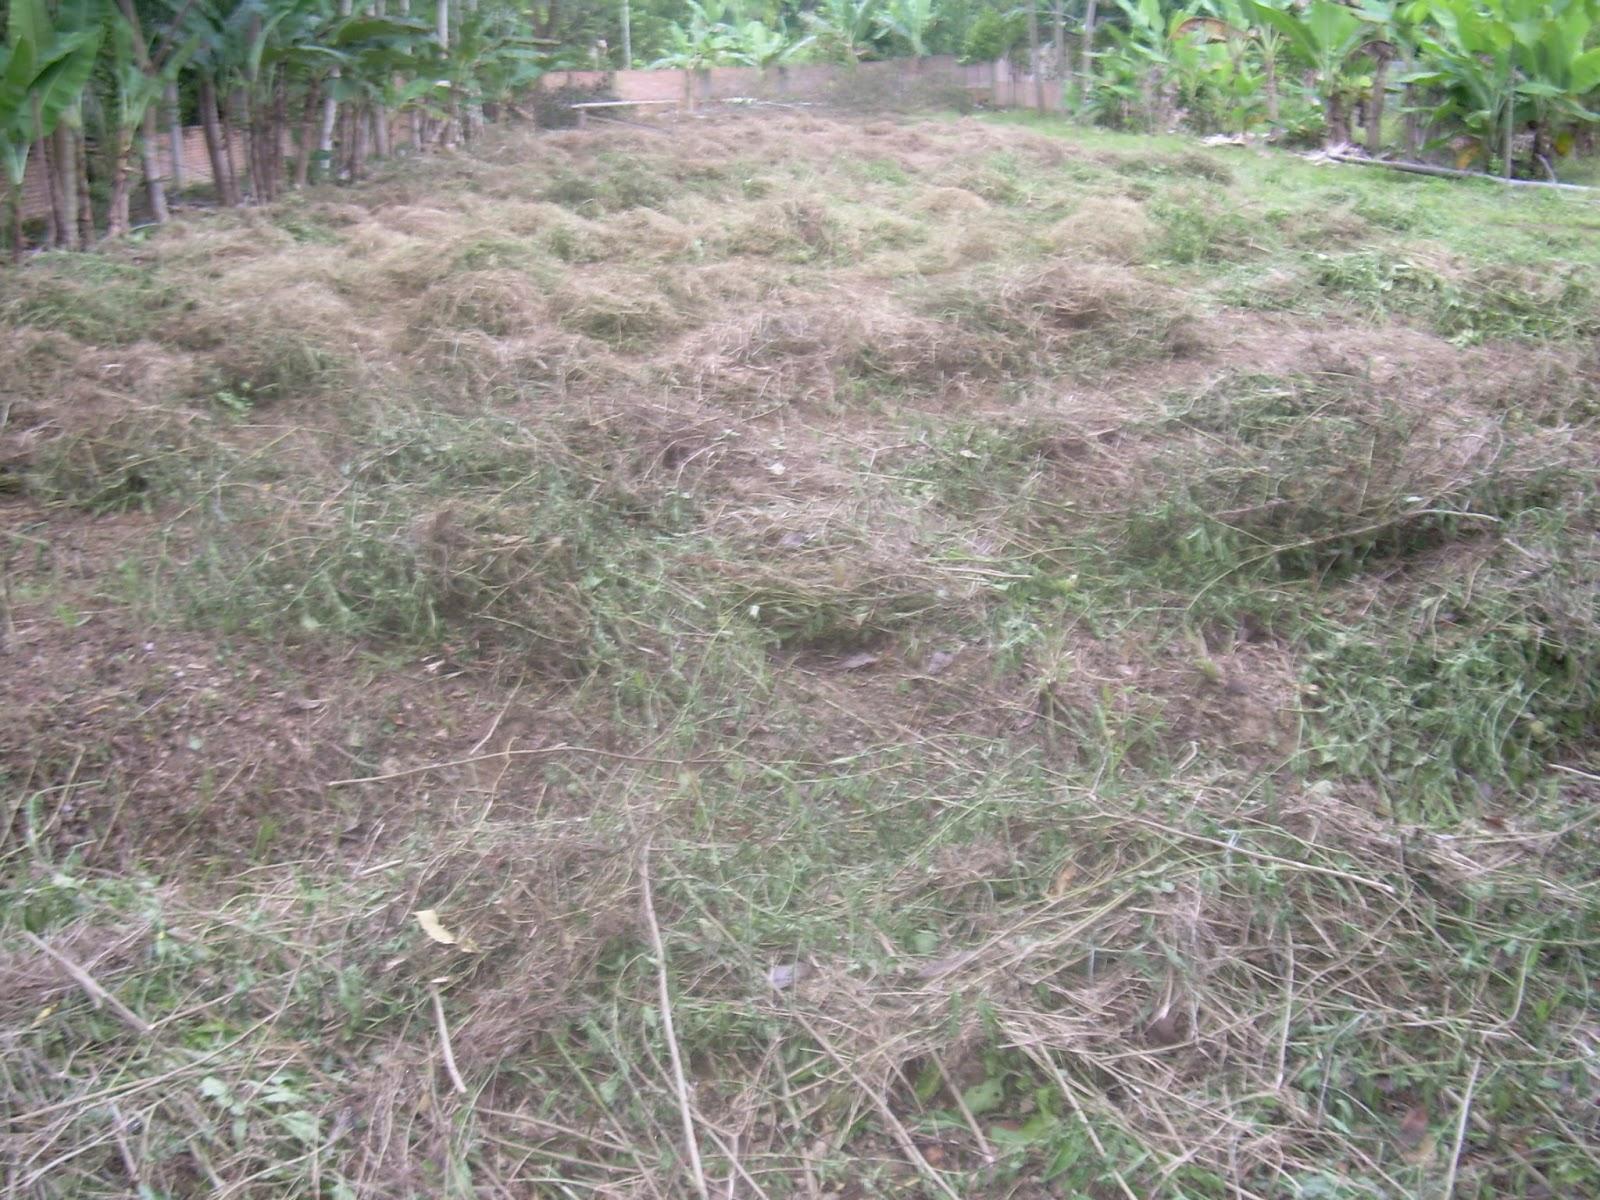 Perumahan MELAYU INDAH PERMAI Residence: Pembersihan Lahan